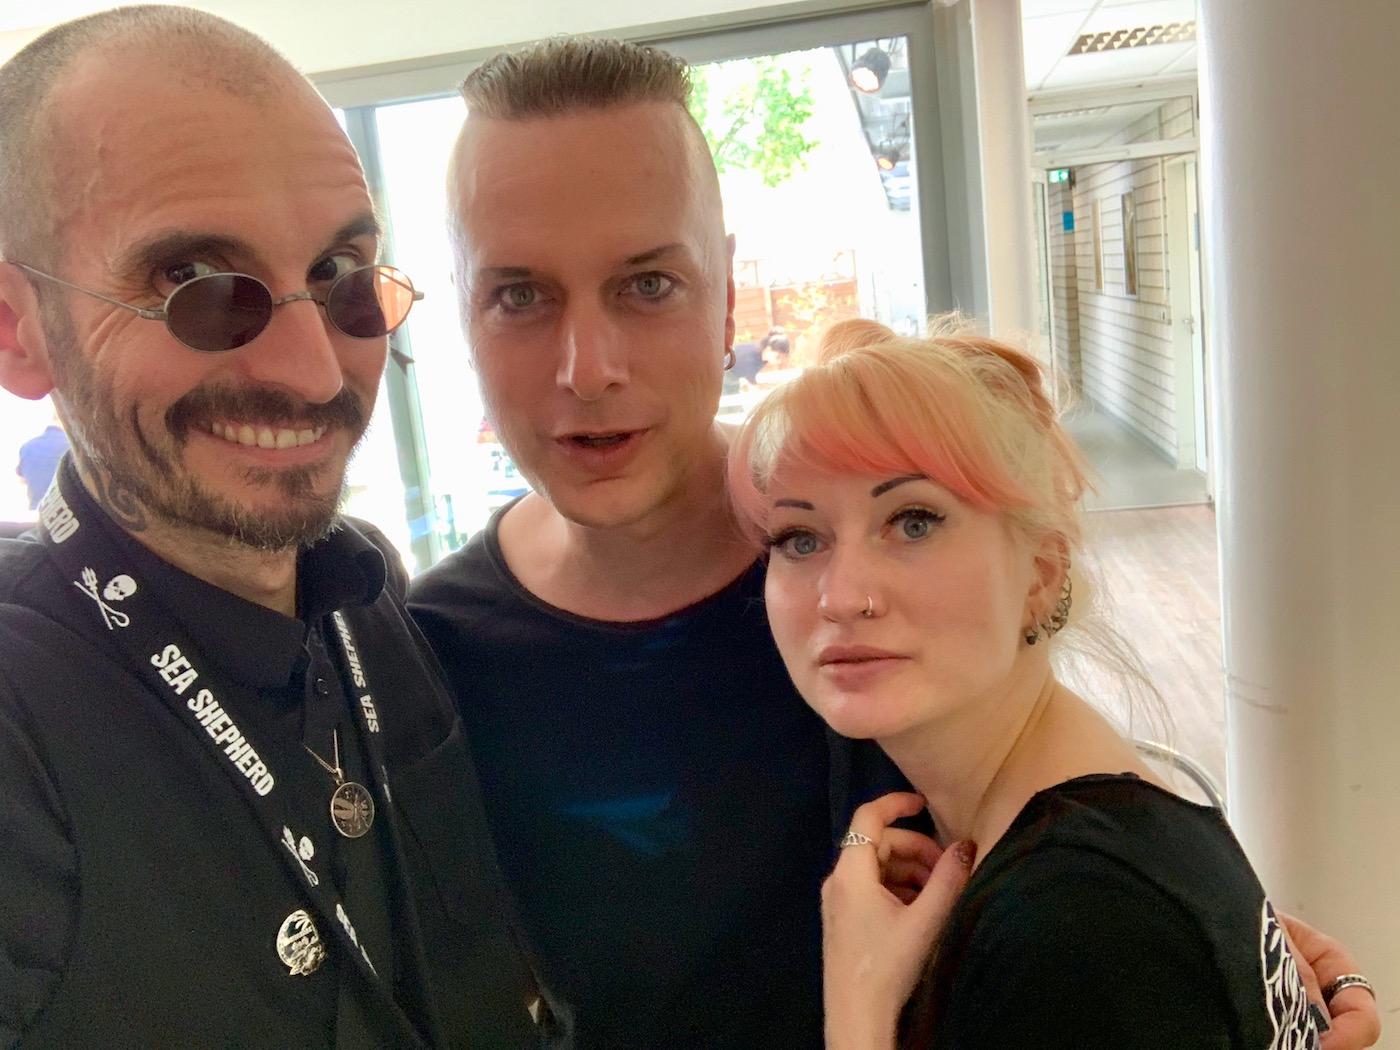 mark_benecke_amphi_festival_koeln_2019 - 32.jpg